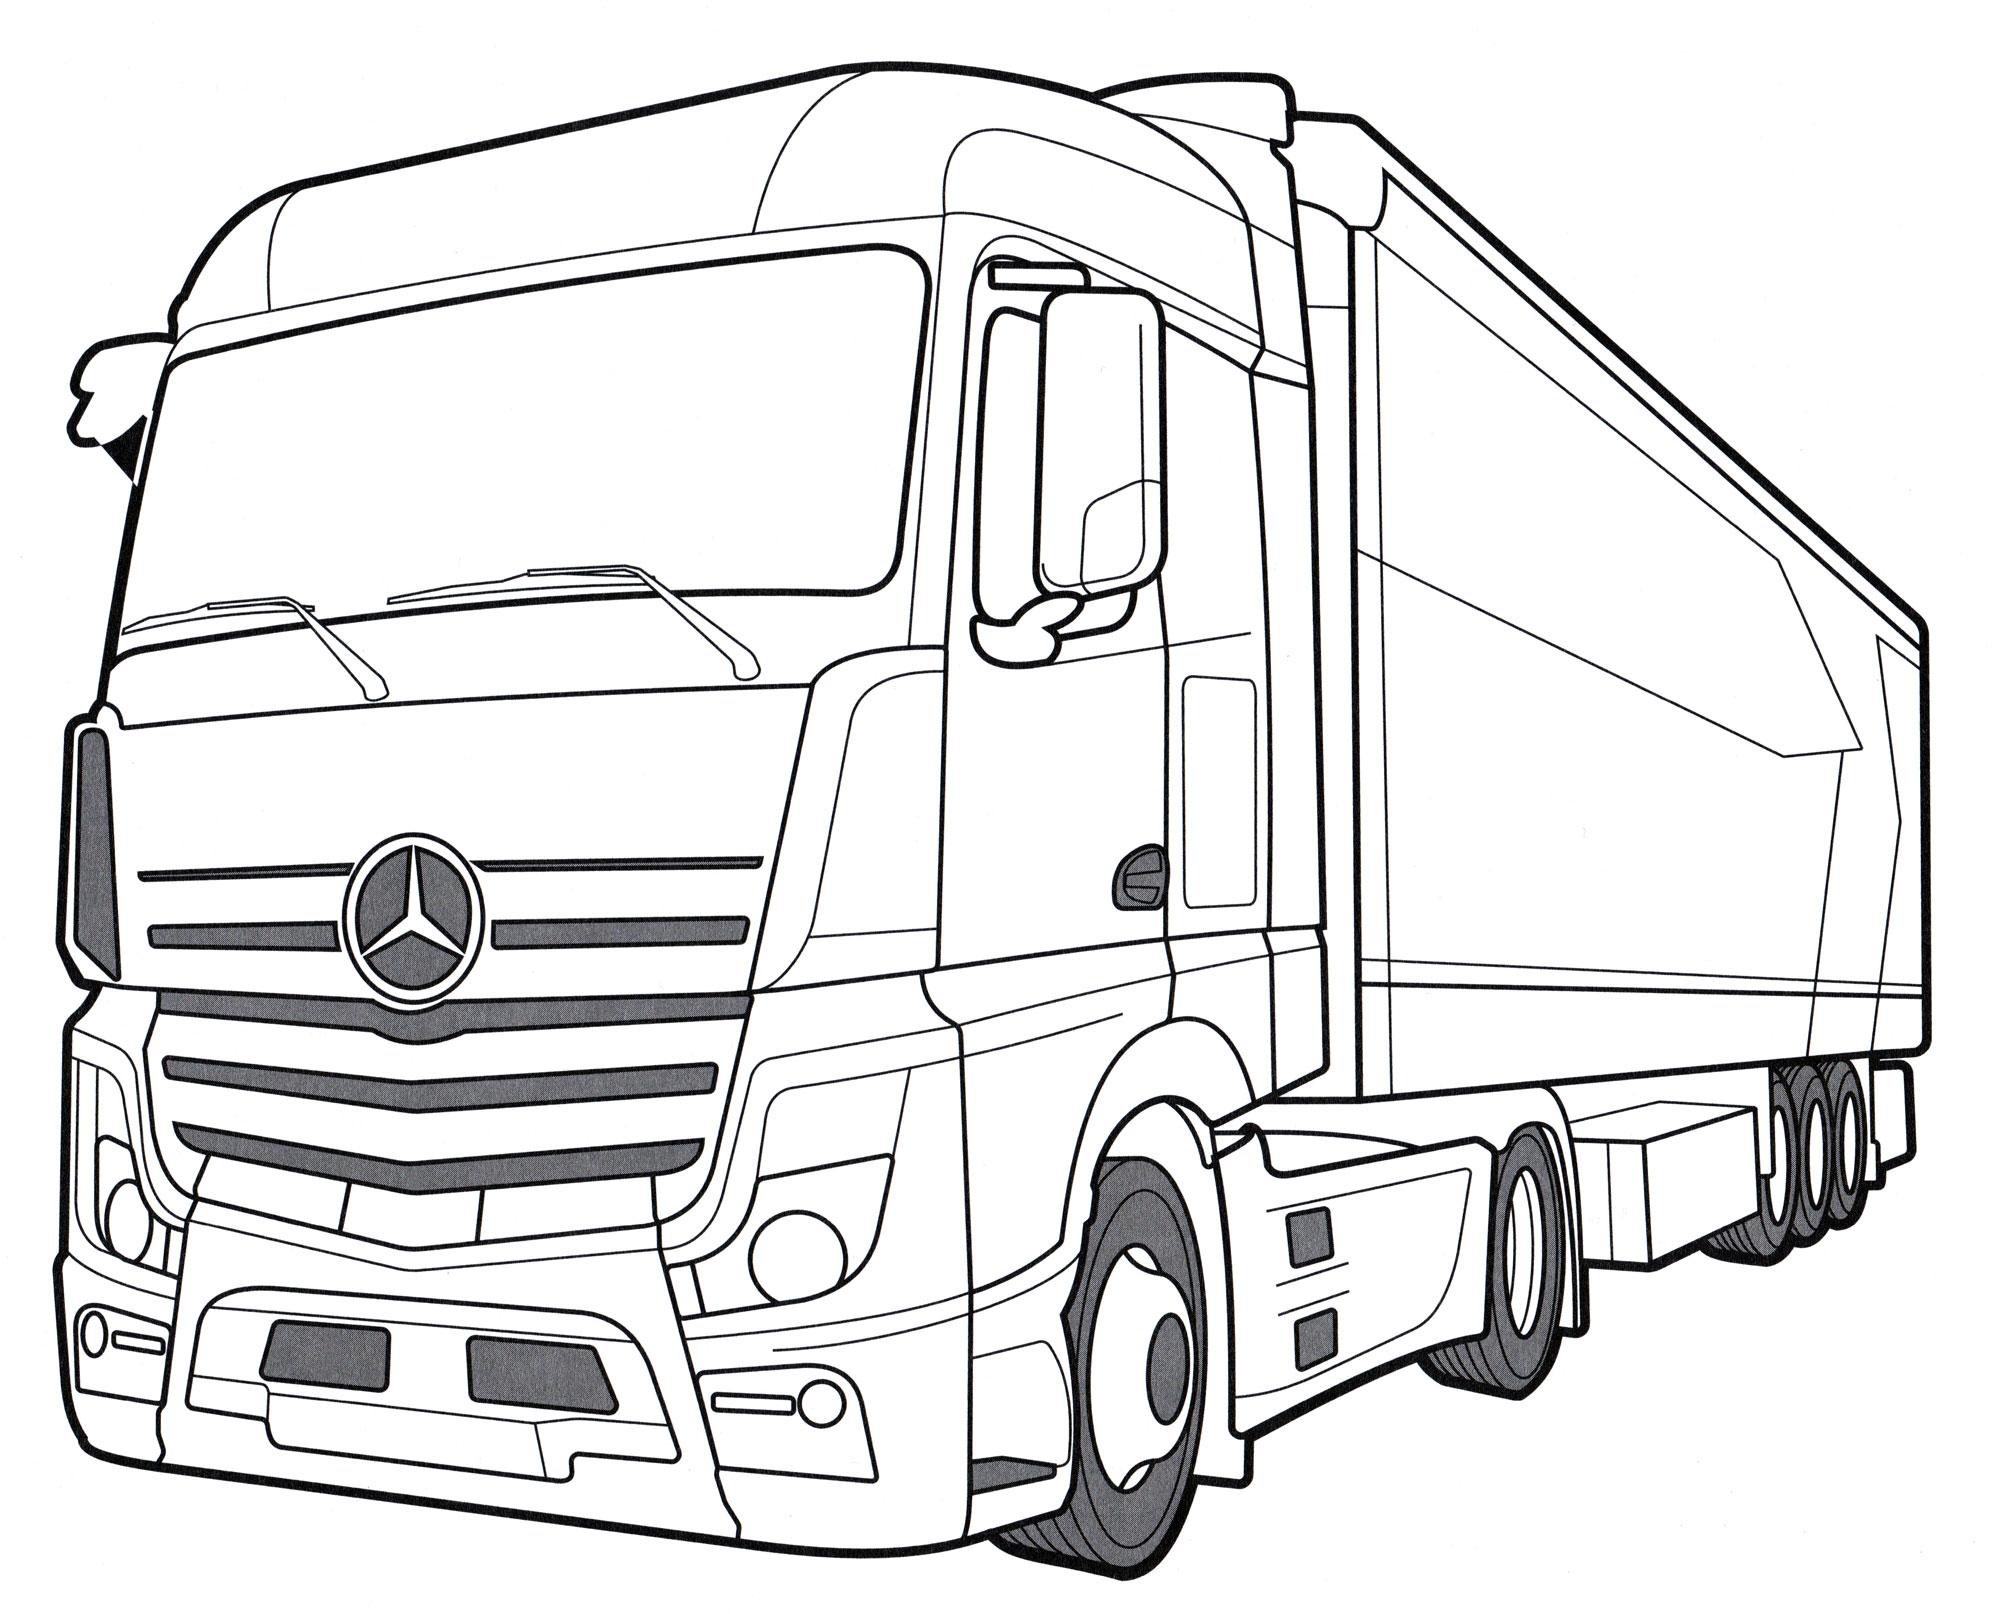 Раскраска Mersedes-Benz Actros IV | Раскраски Грузовики